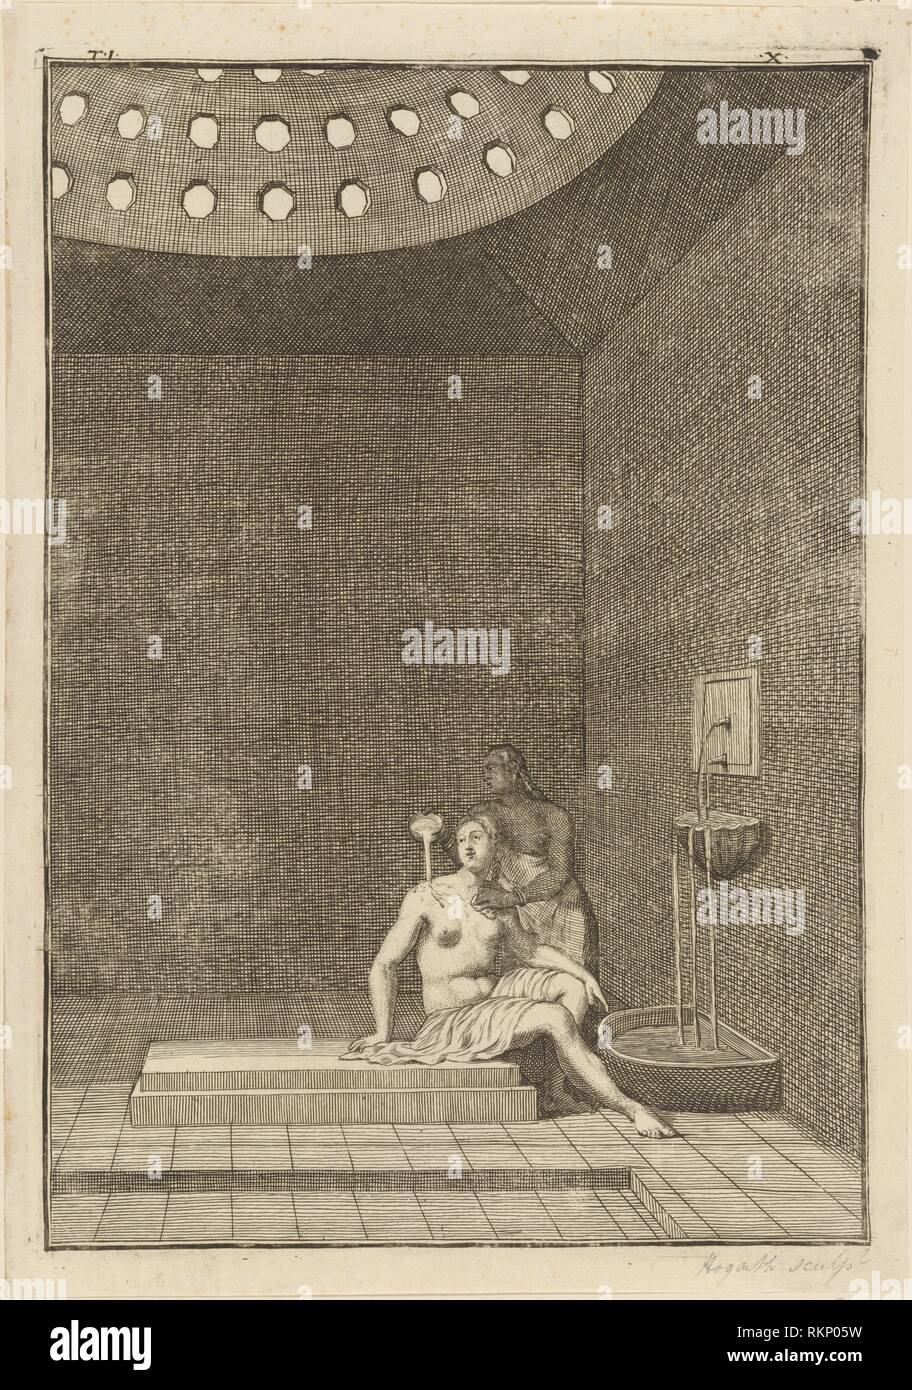 A Turkish Bath. Hogarth, William, 1697-1764 (Printmaker). William Hogarth: prints. Date Created: 1723. Prints. Still image. - Stock Image